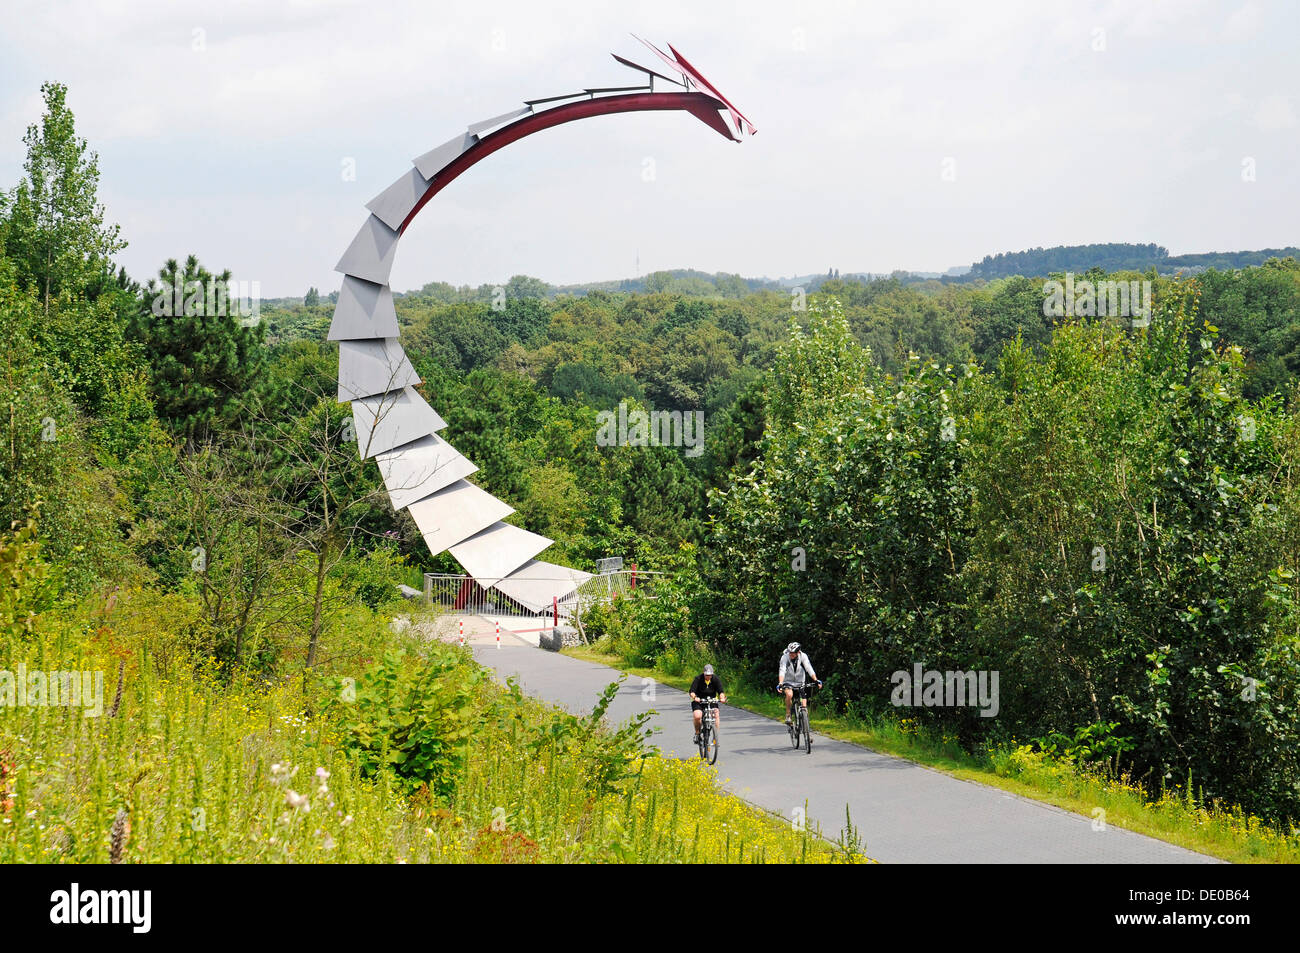 Dragon's bridge, Halde Hoheward, mine heap, landscape park, Herten, Ruhr Area, North Rhine-Westphalia Stock Photo